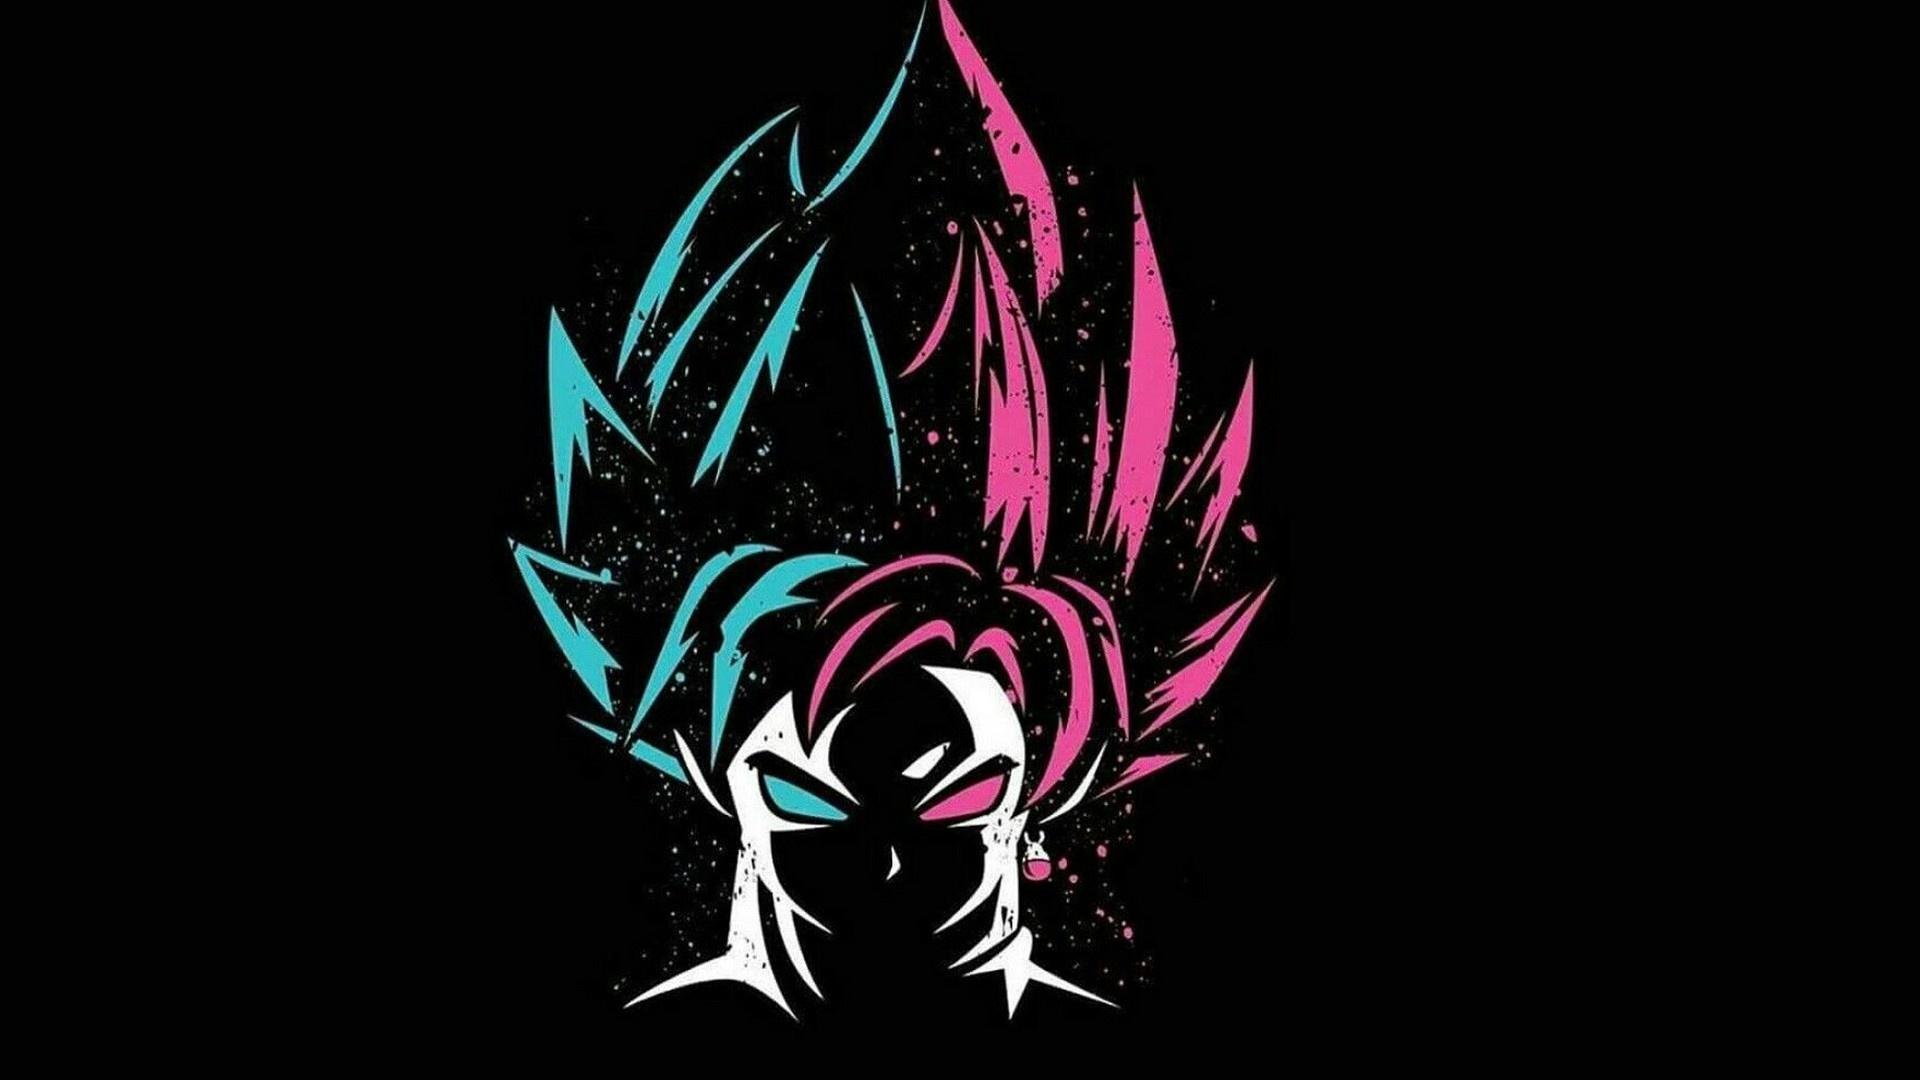 Goku Black background picture